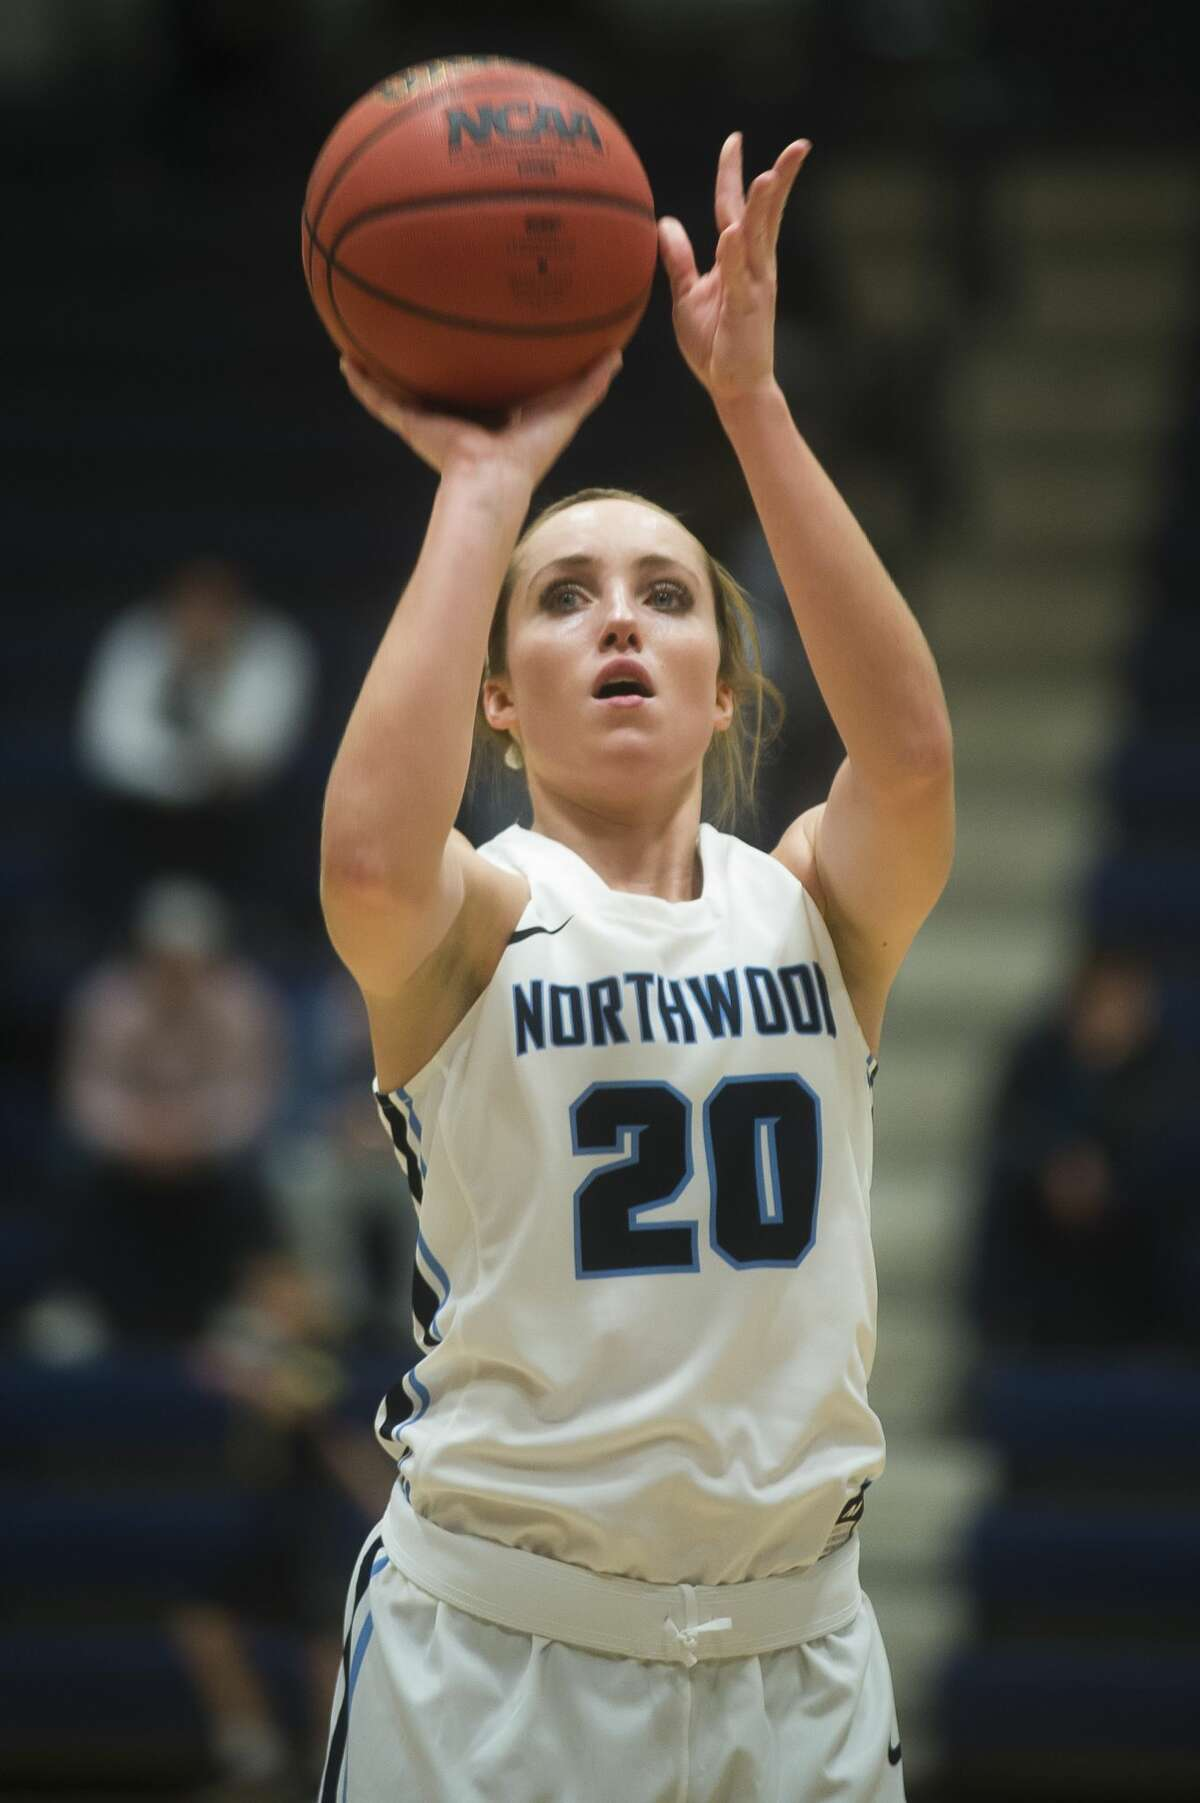 Northwood senior Lindsay Orwat takes a free throw during Northwood's game against Lewis on Friday, Nov. 17, 2017 at Northwood University. (Katy Kildee/kkildee@mdn.net)